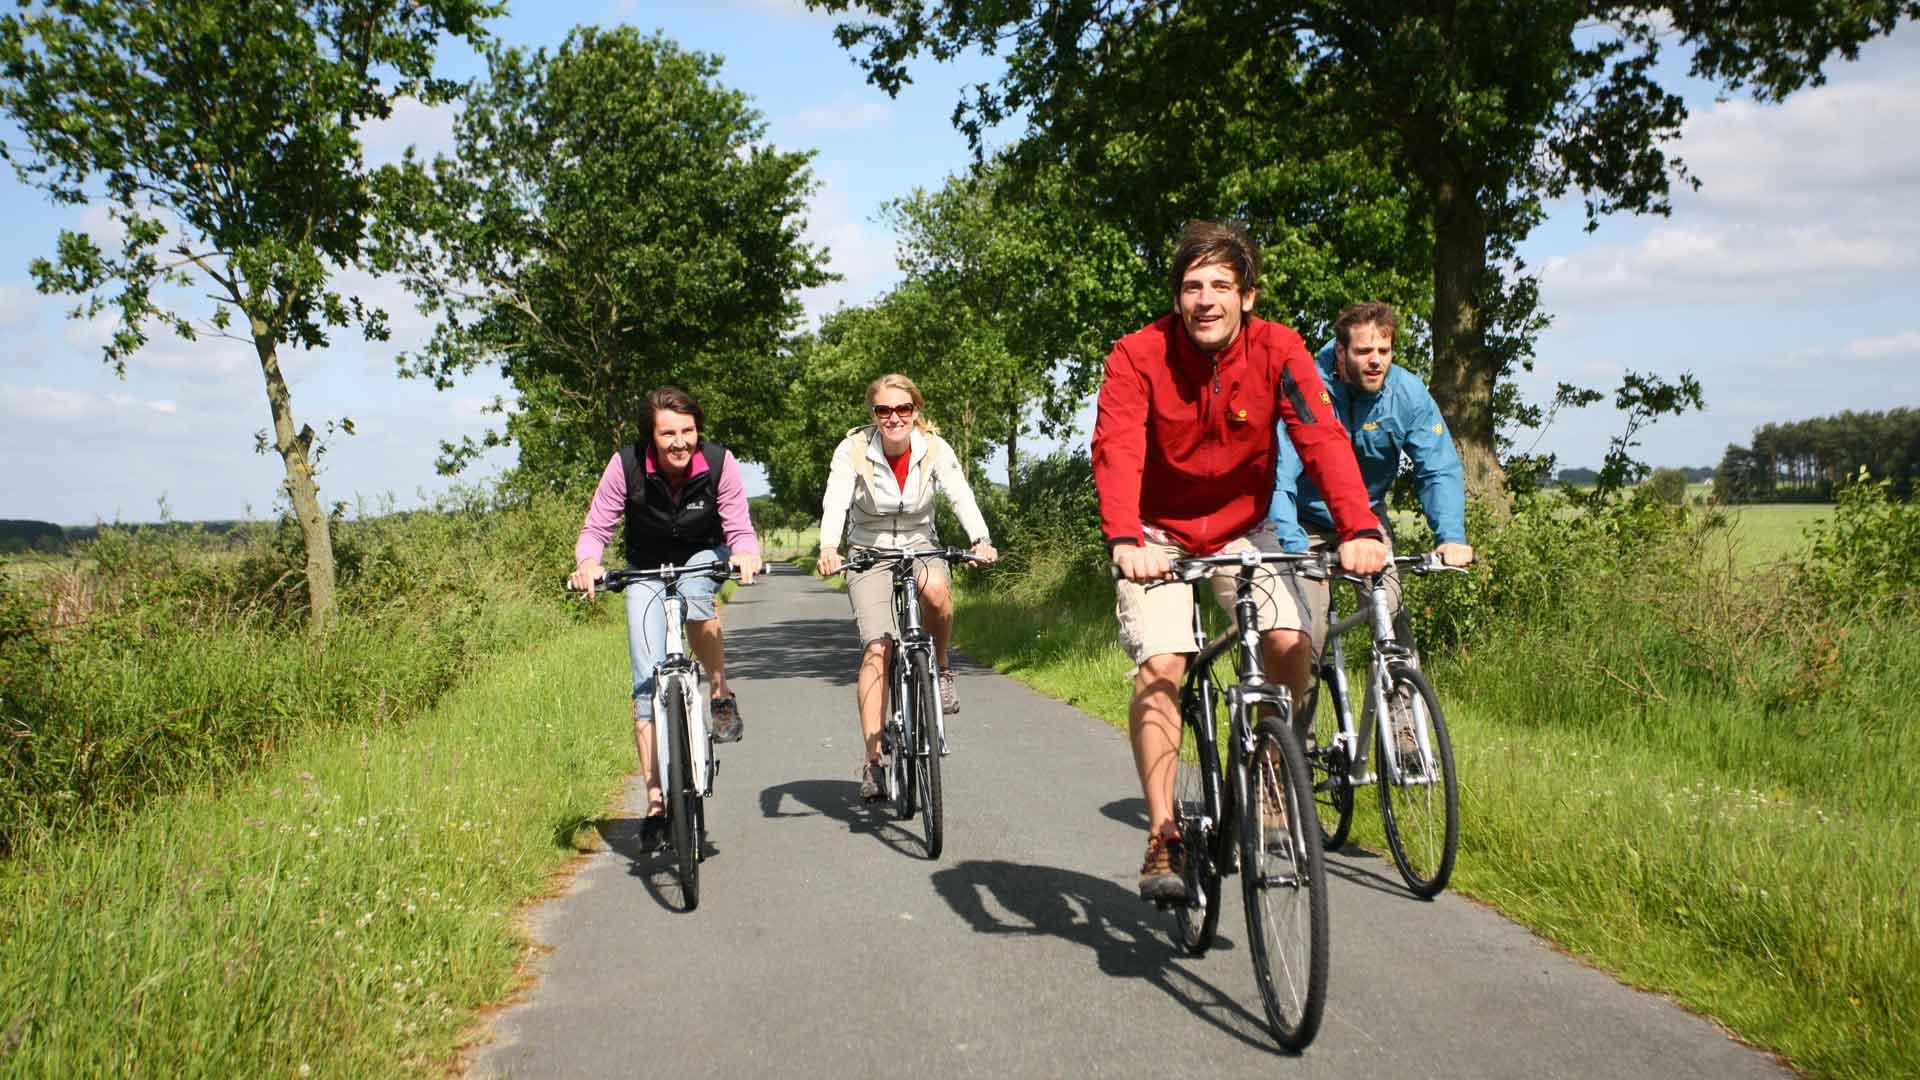 Ontspannen fietsen op rustige wegen op de EmsRadweg